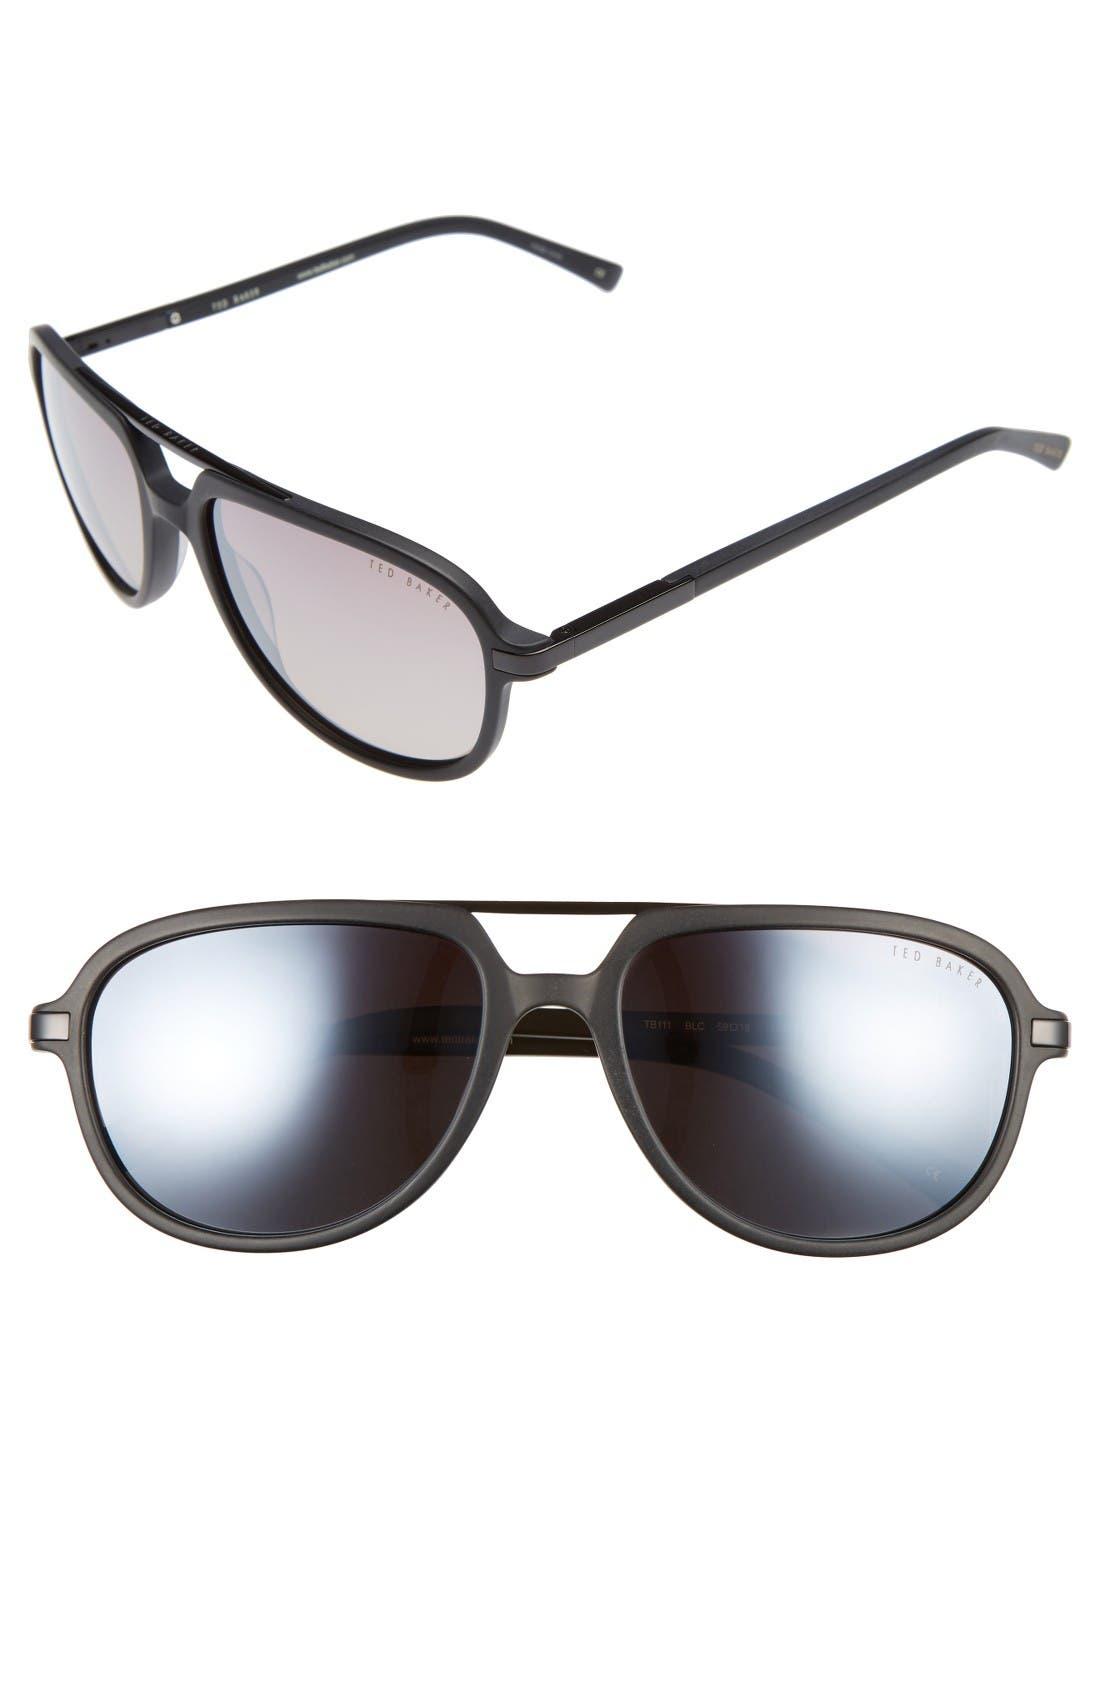 Alternate Image 1 Selected - Ted Baker London 59mm Polarized Aviator Sunglasses